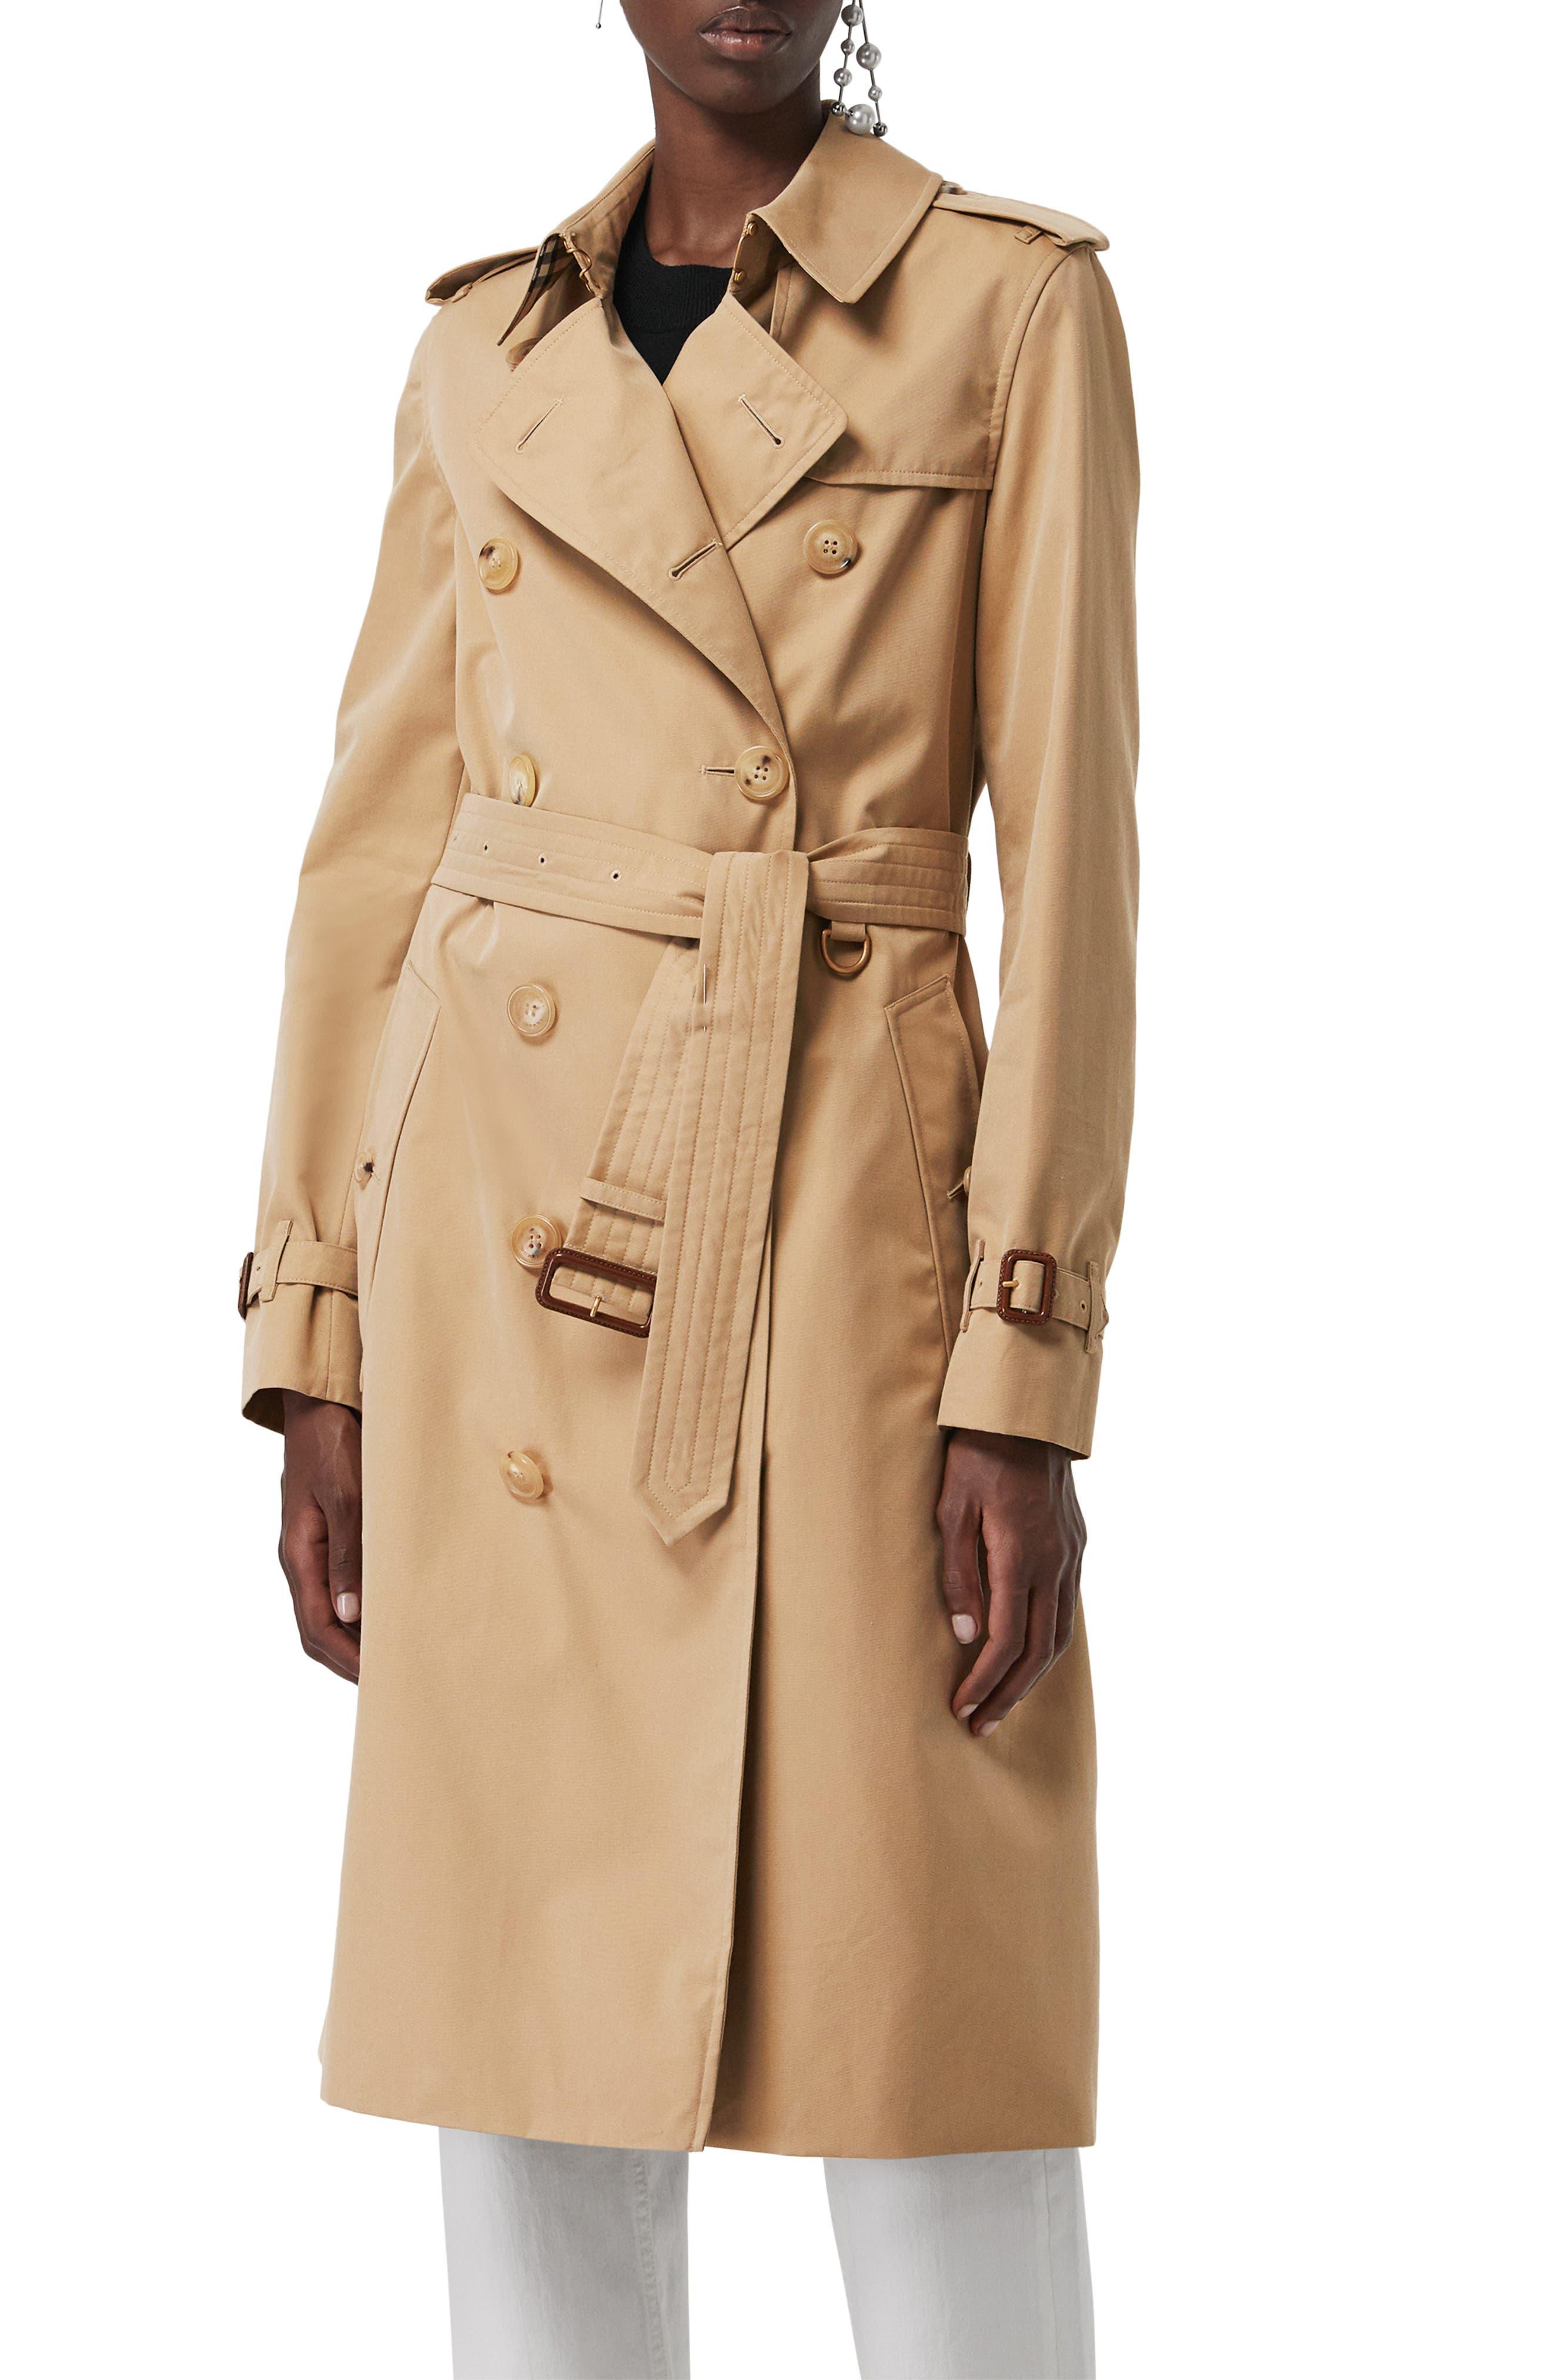 BURBERRY, Kensington Long Trench Coat, Alternate thumbnail 5, color, DARK HONEY